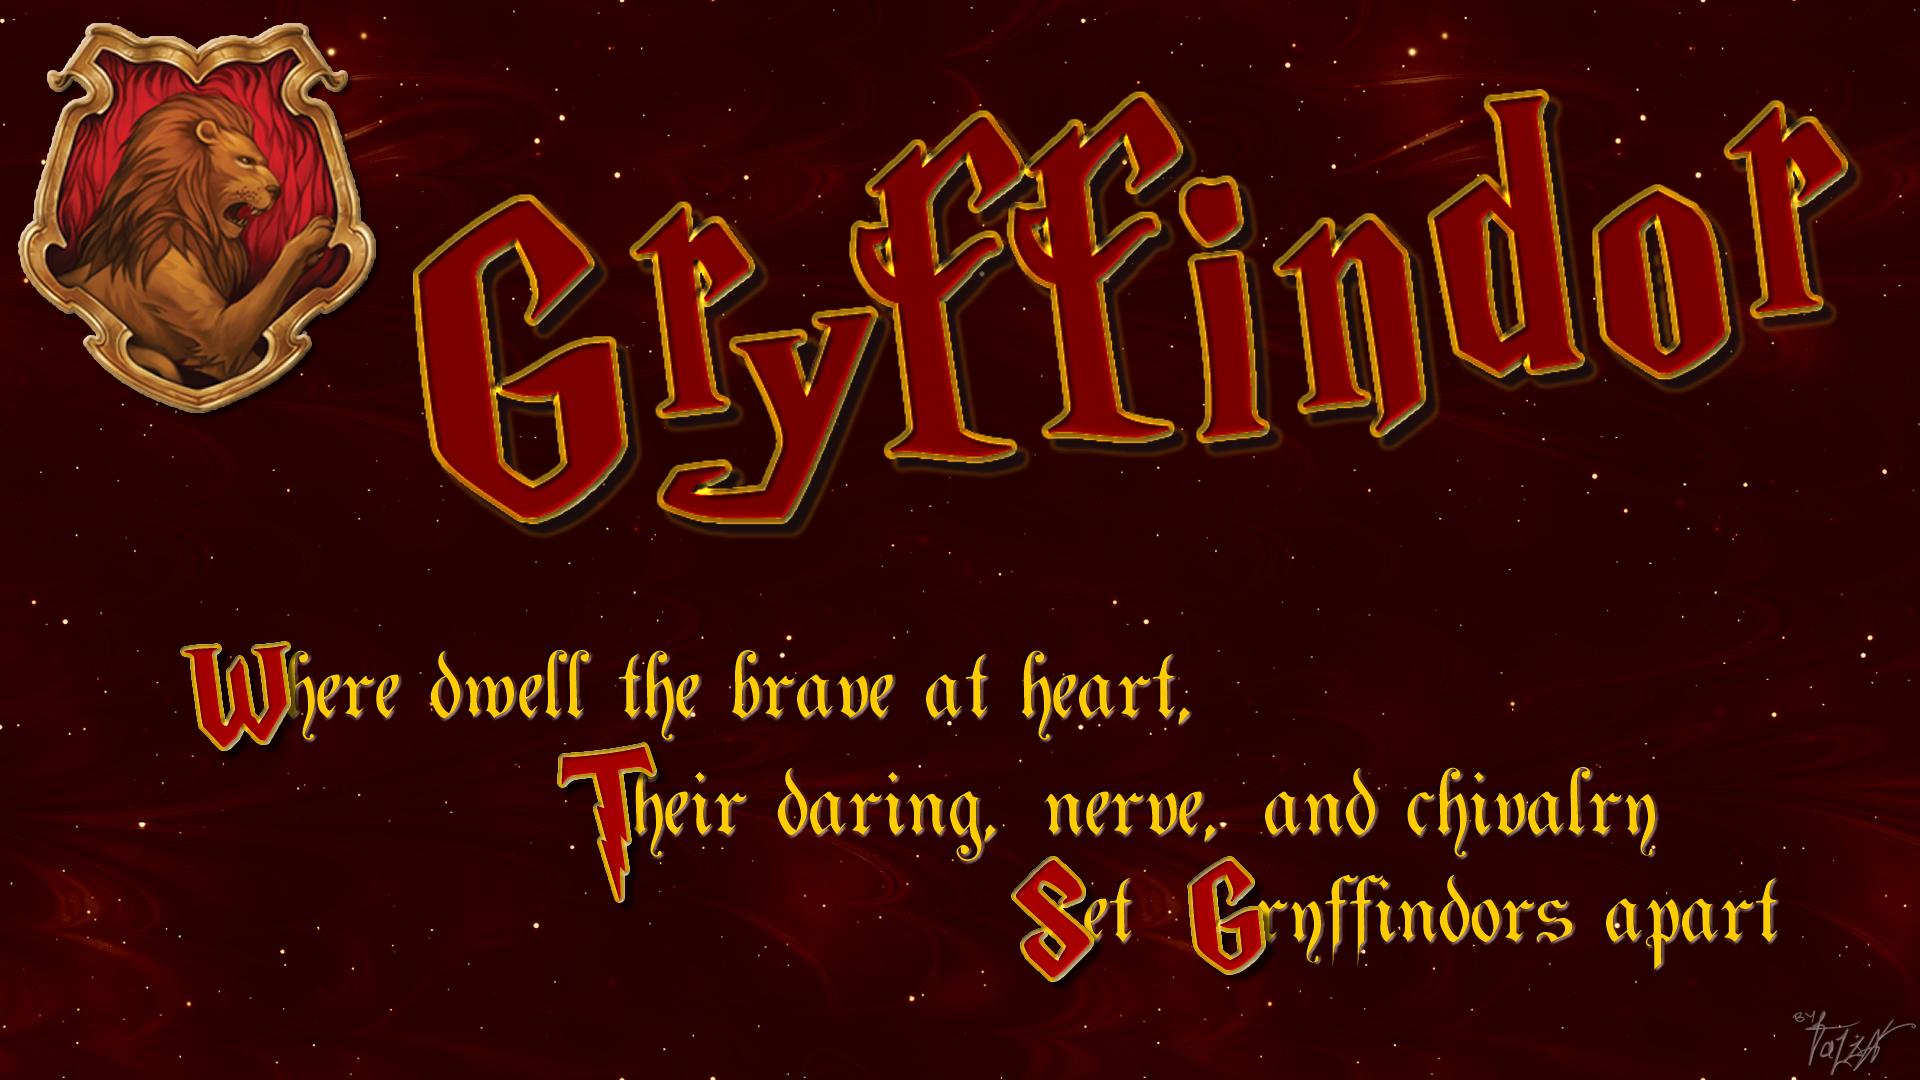 Harry Potter 高清壁紙   桌面背景   1920x1080   ID:556239 - Wallpaper Abyss